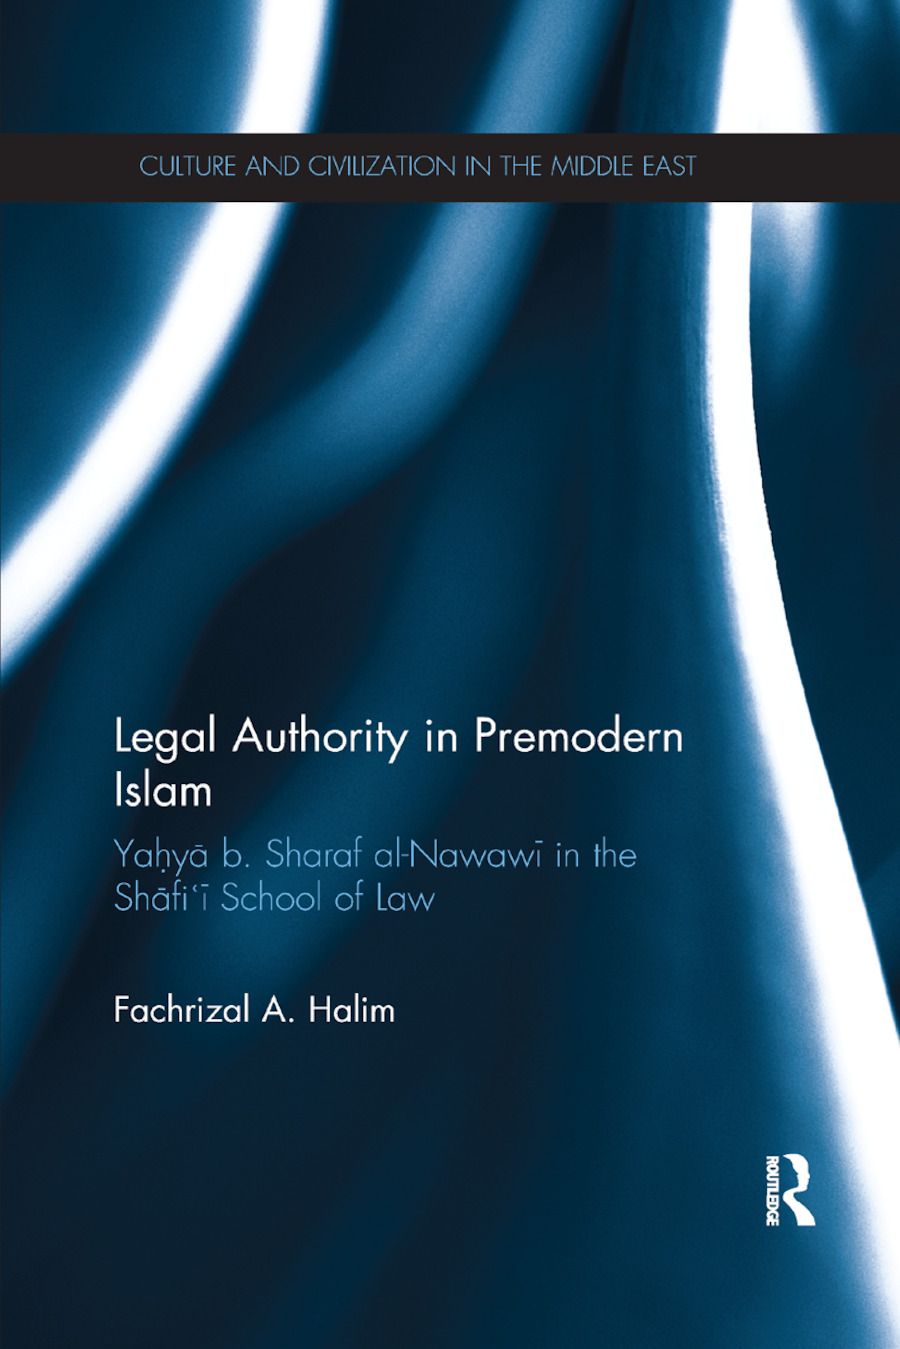 Legal Authority in Premodern Islam: Yahya B Sharaf Al-Nawawi in the Shafi'i School of Law book cover